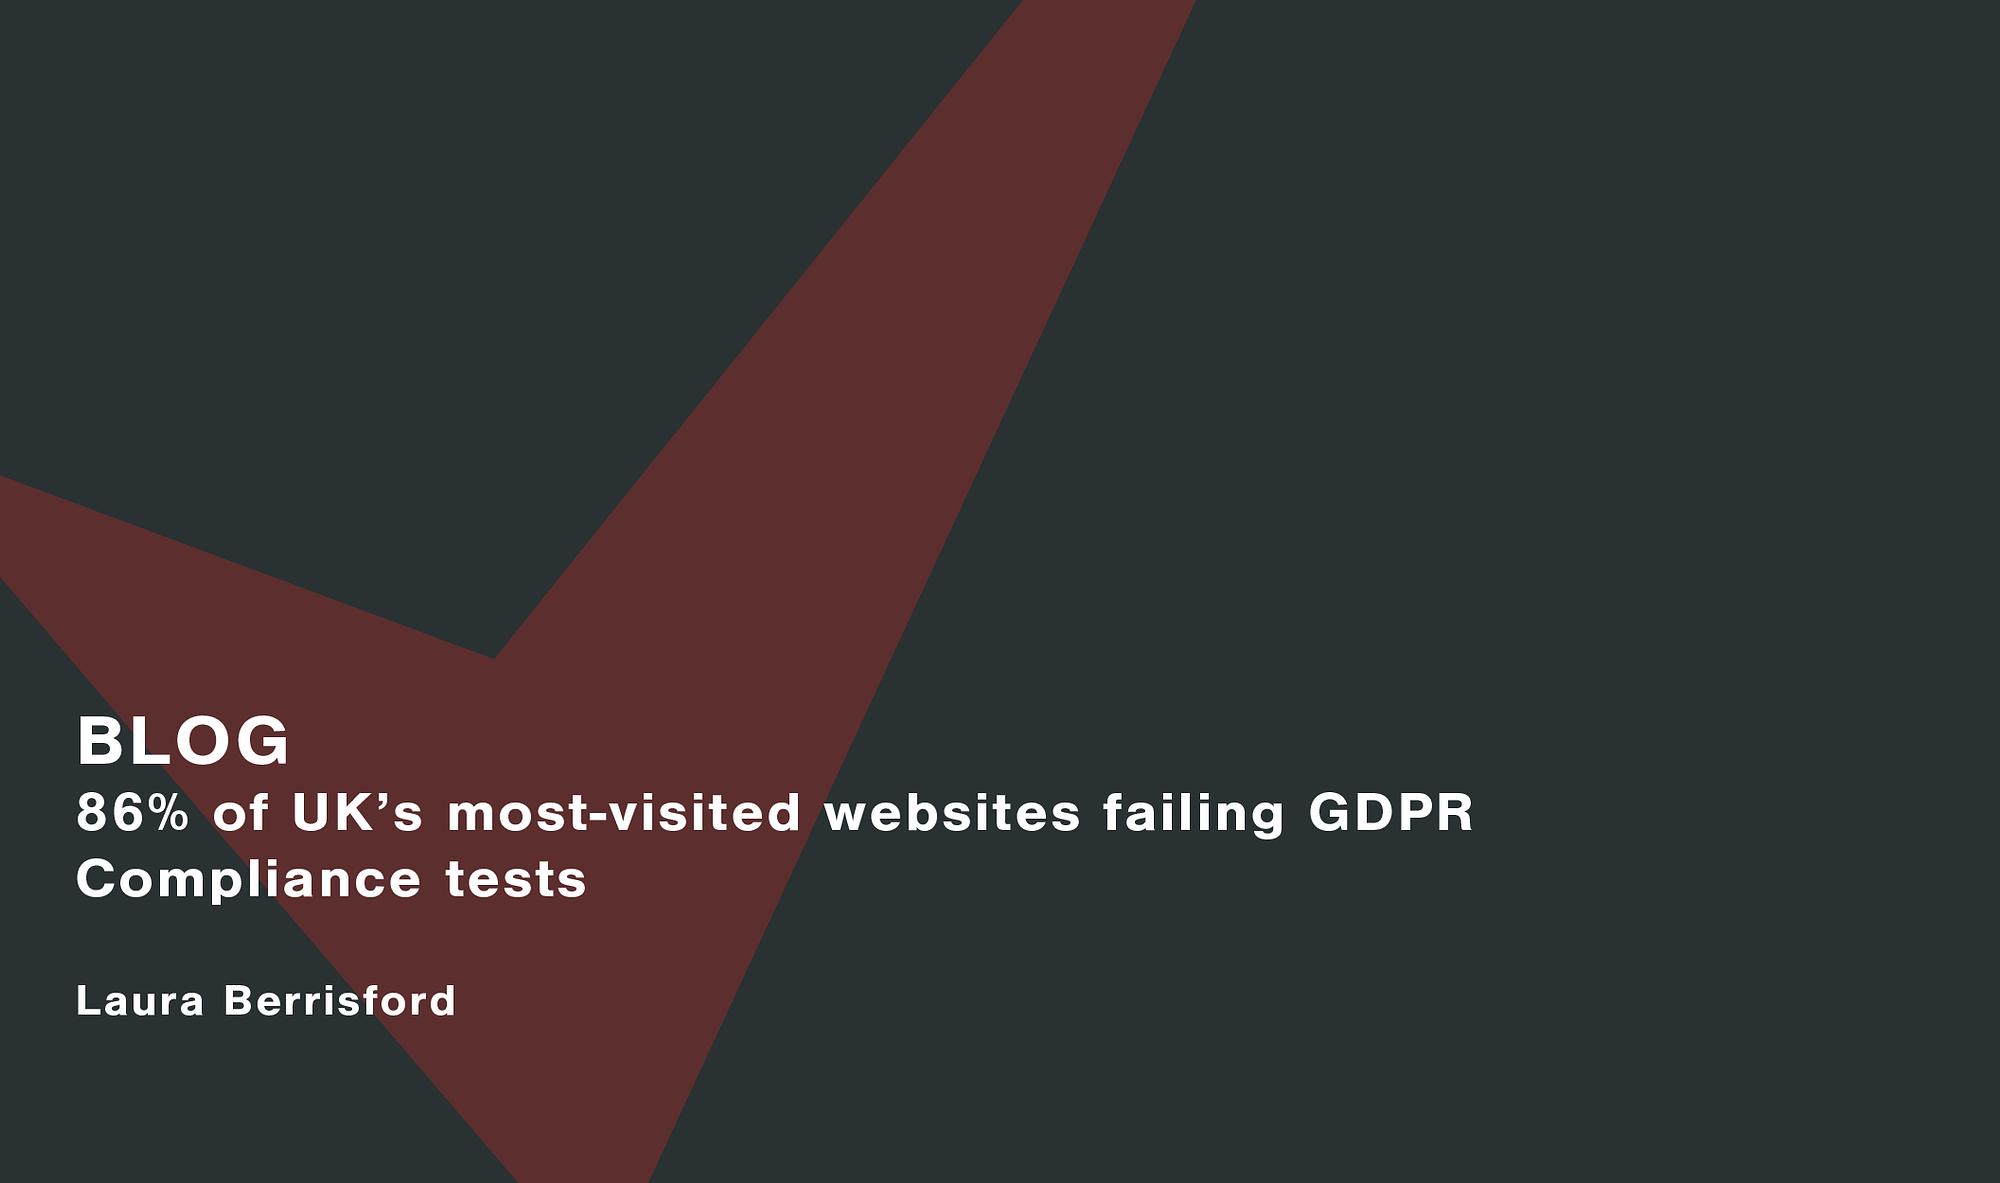 86-of-UKs-most-visited-websites-failing-GDPR-Compliance-tests